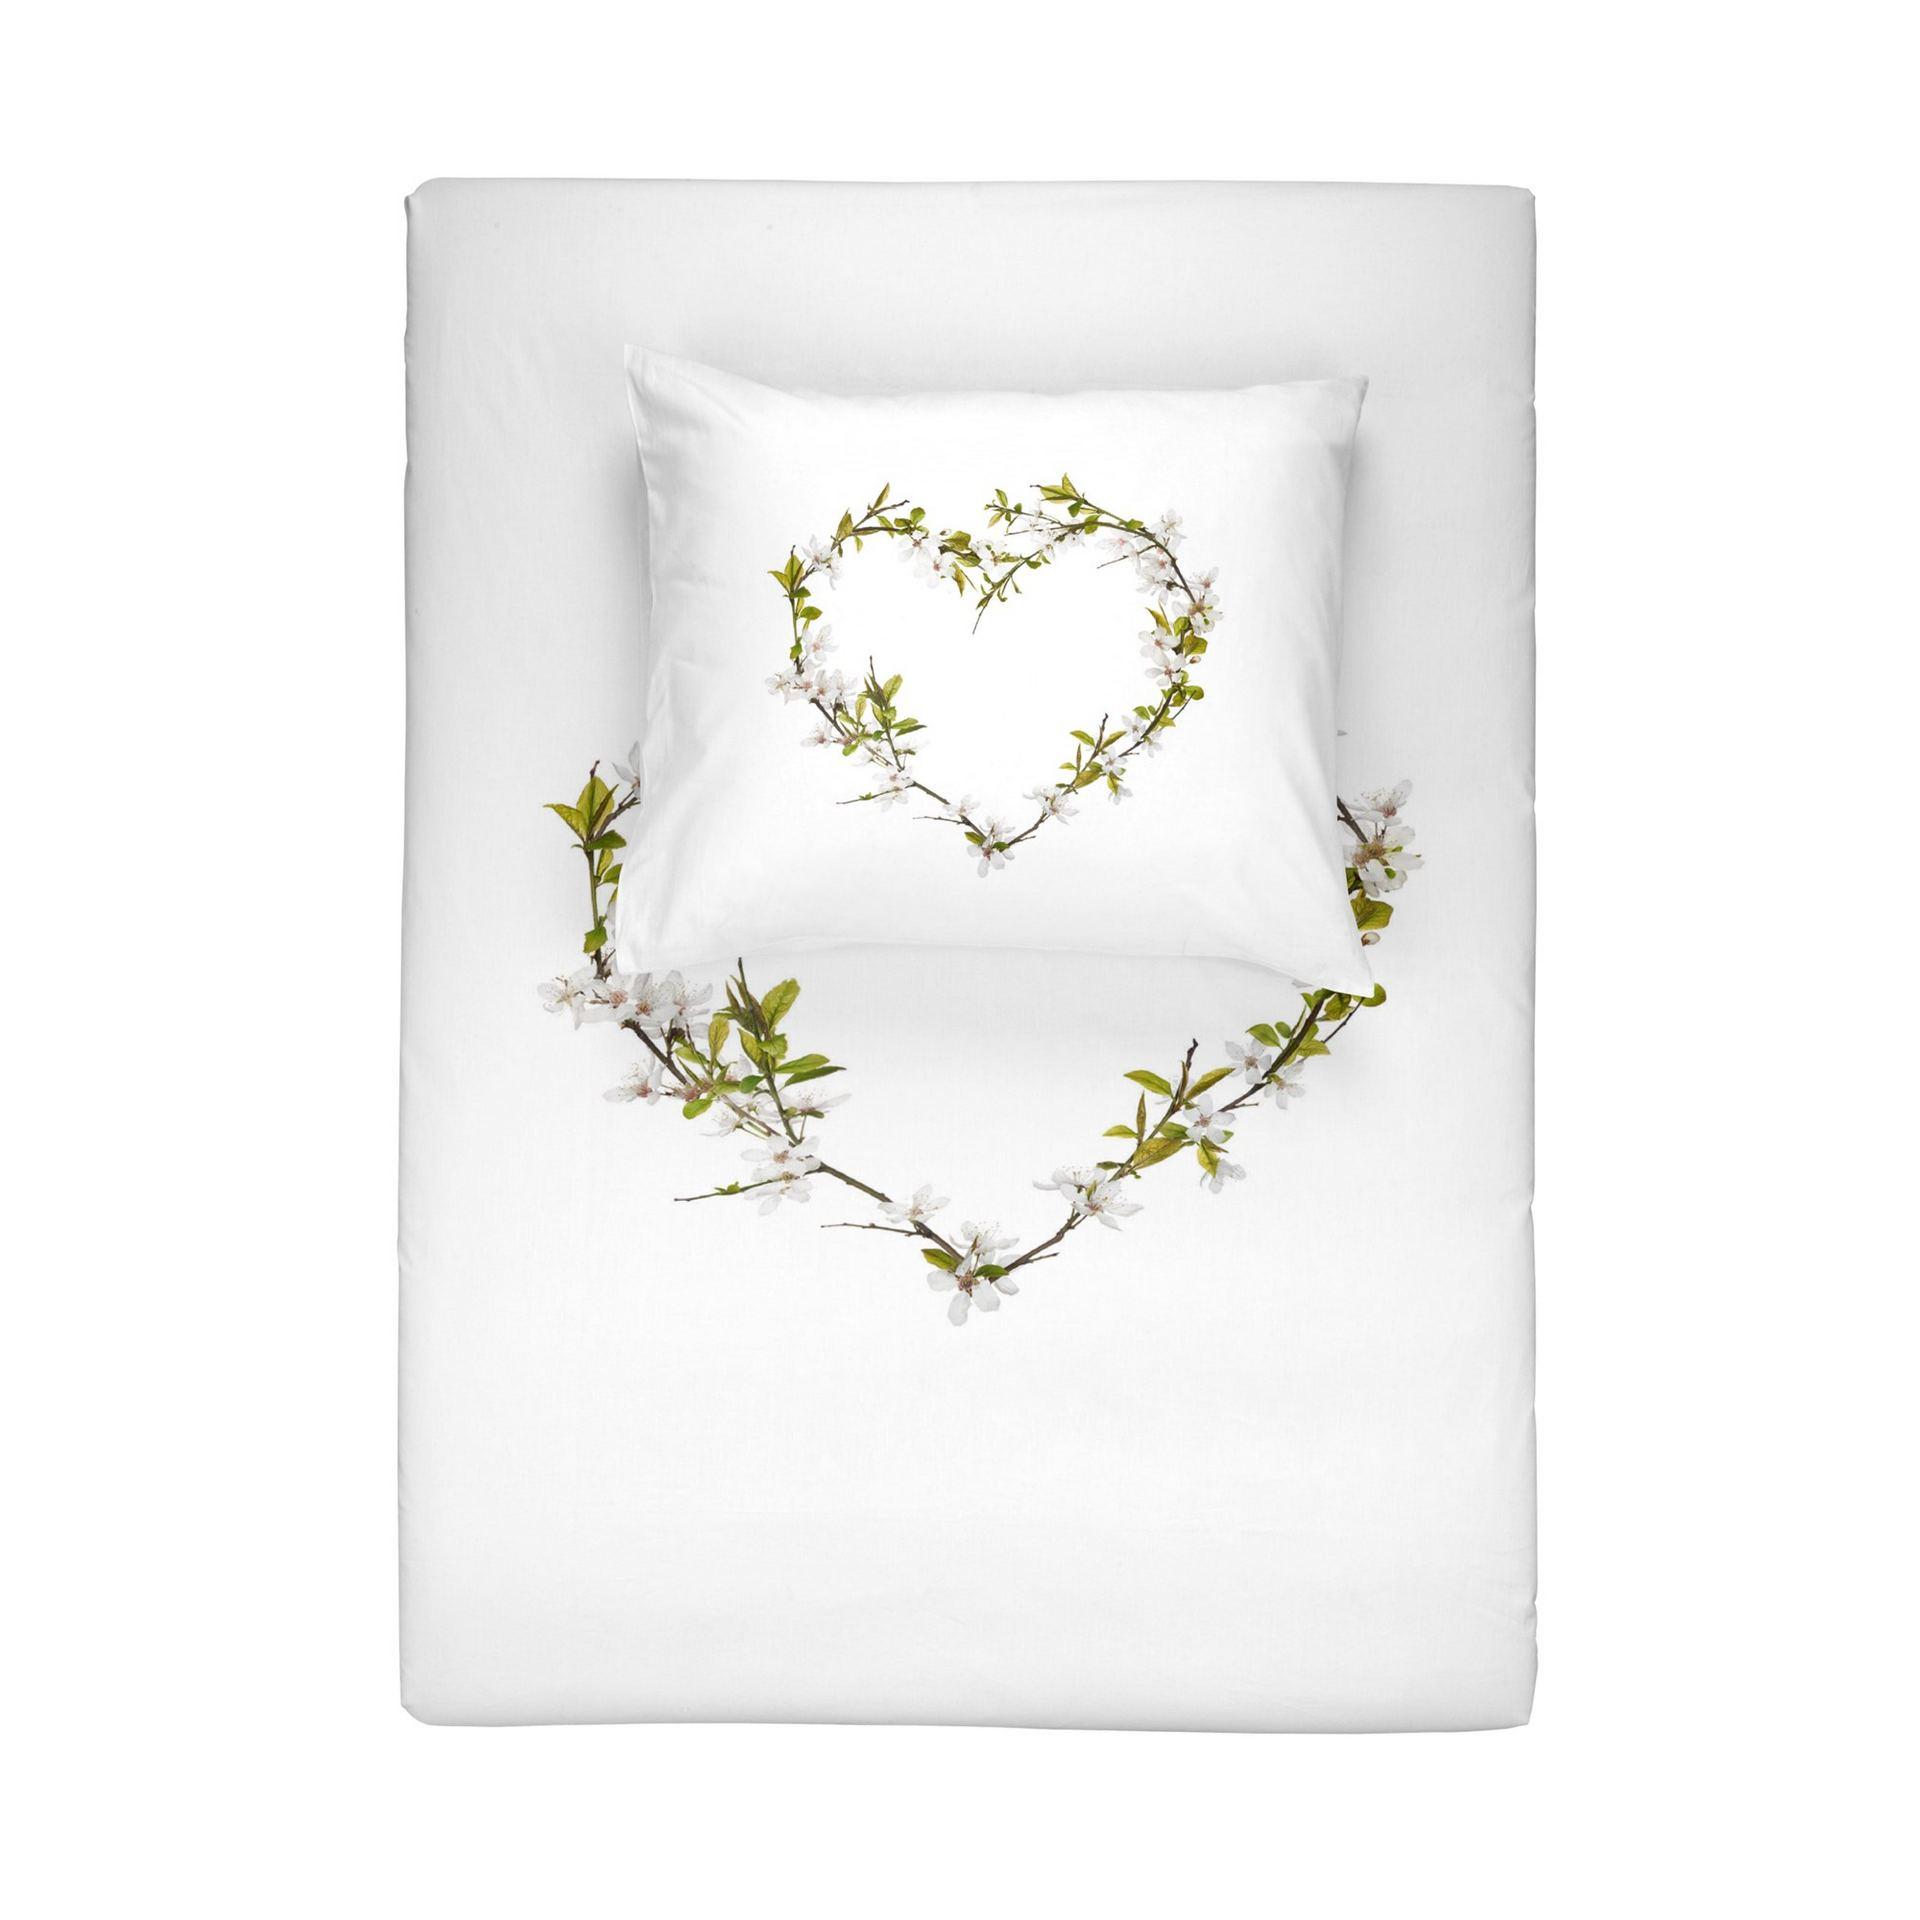 Dekbedovertrek Walra Blossom Wit 140x220 cm 1-persoons dekbedovertrek